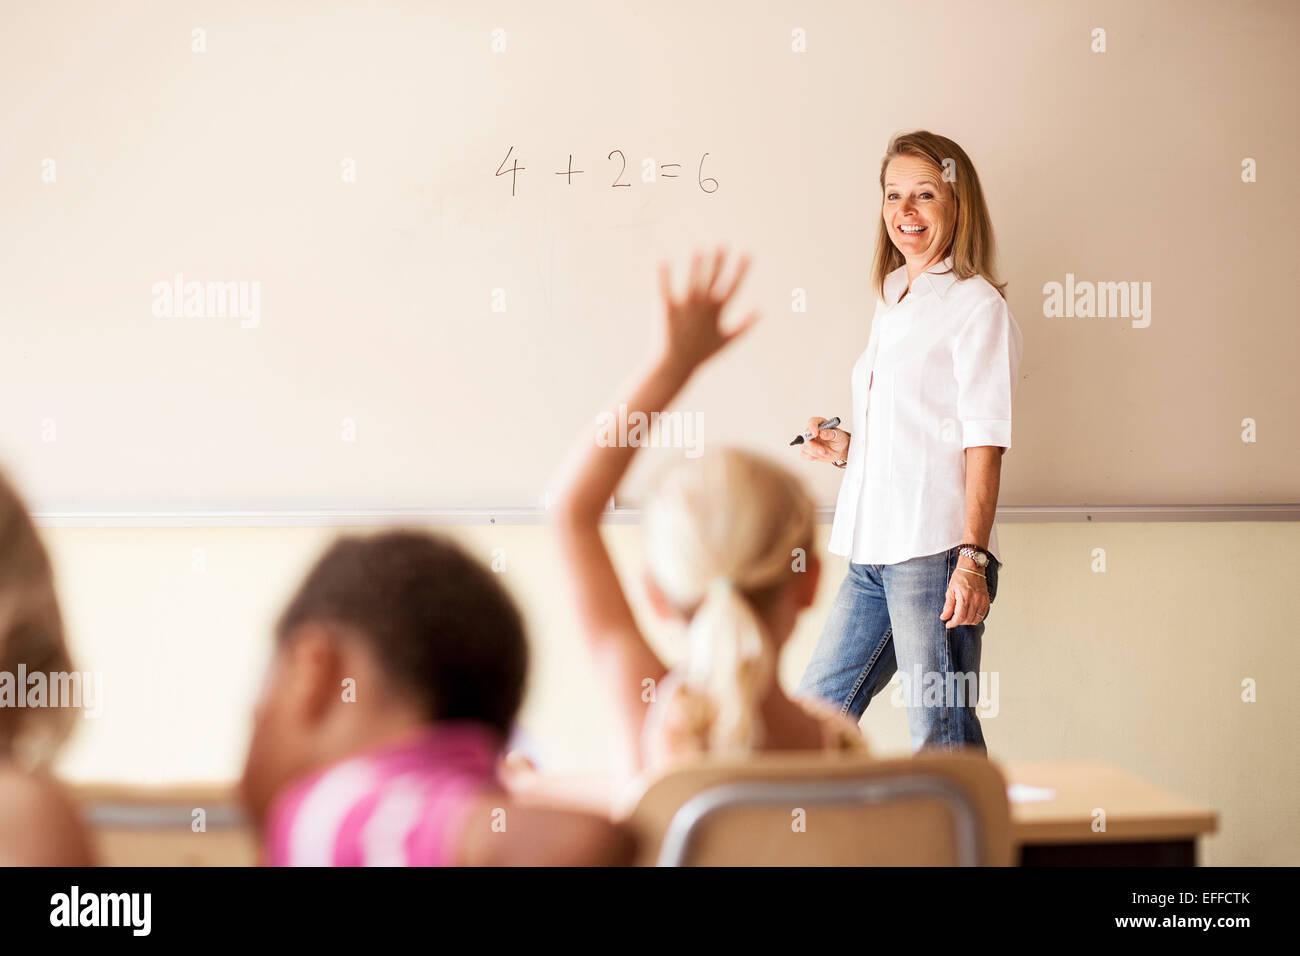 Mature teacher teaching mathematics to children in classroom - Stock Image